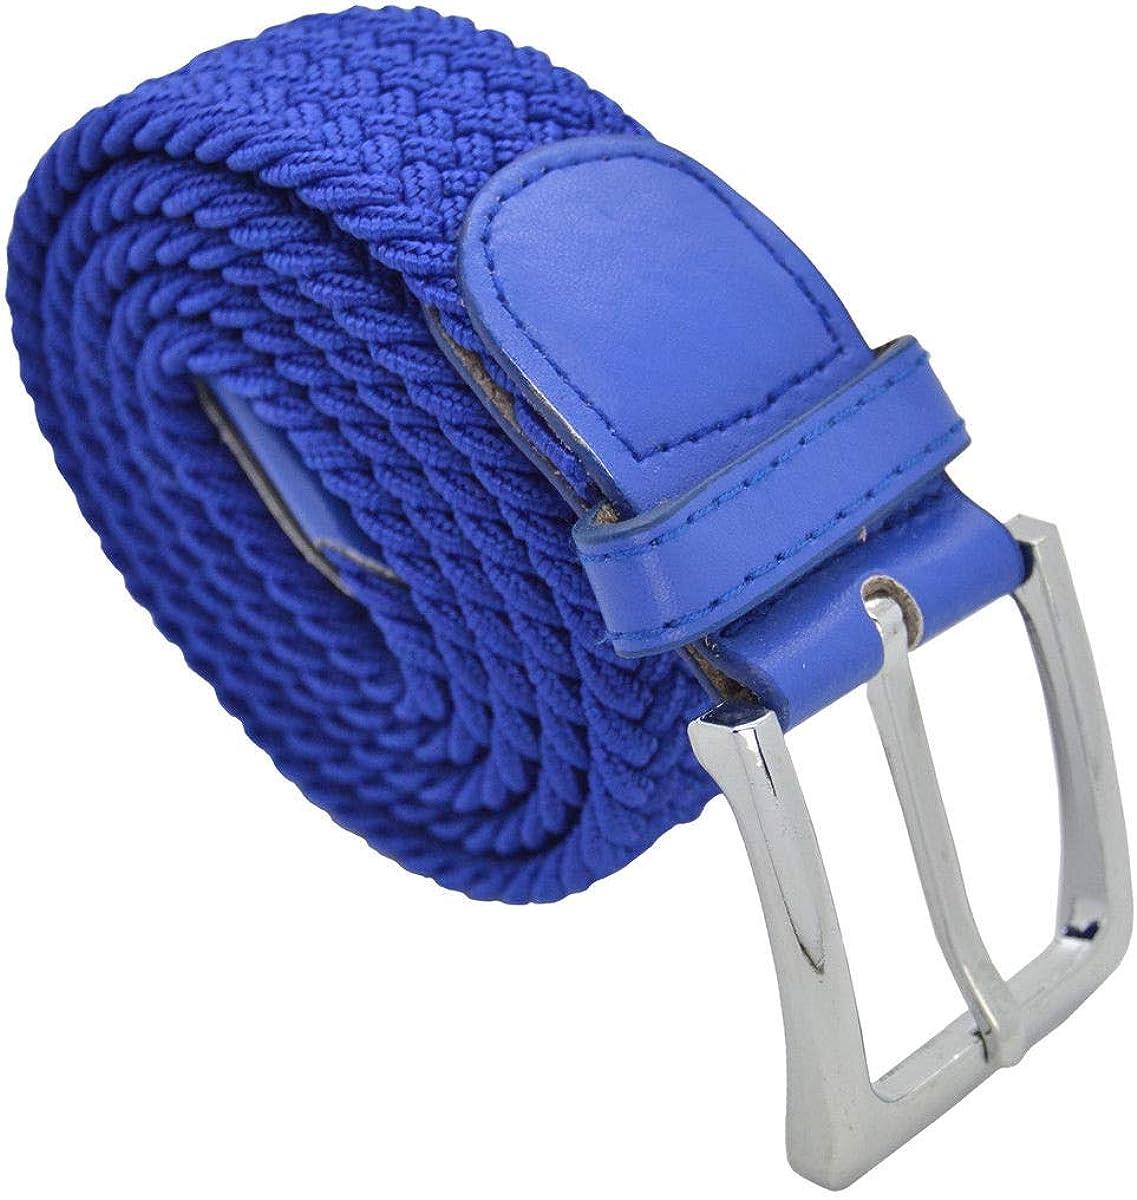 Royal Blue #AAAS Top Men Elastic Fabric Woven Belt Expandable Braided Stretch Belt L